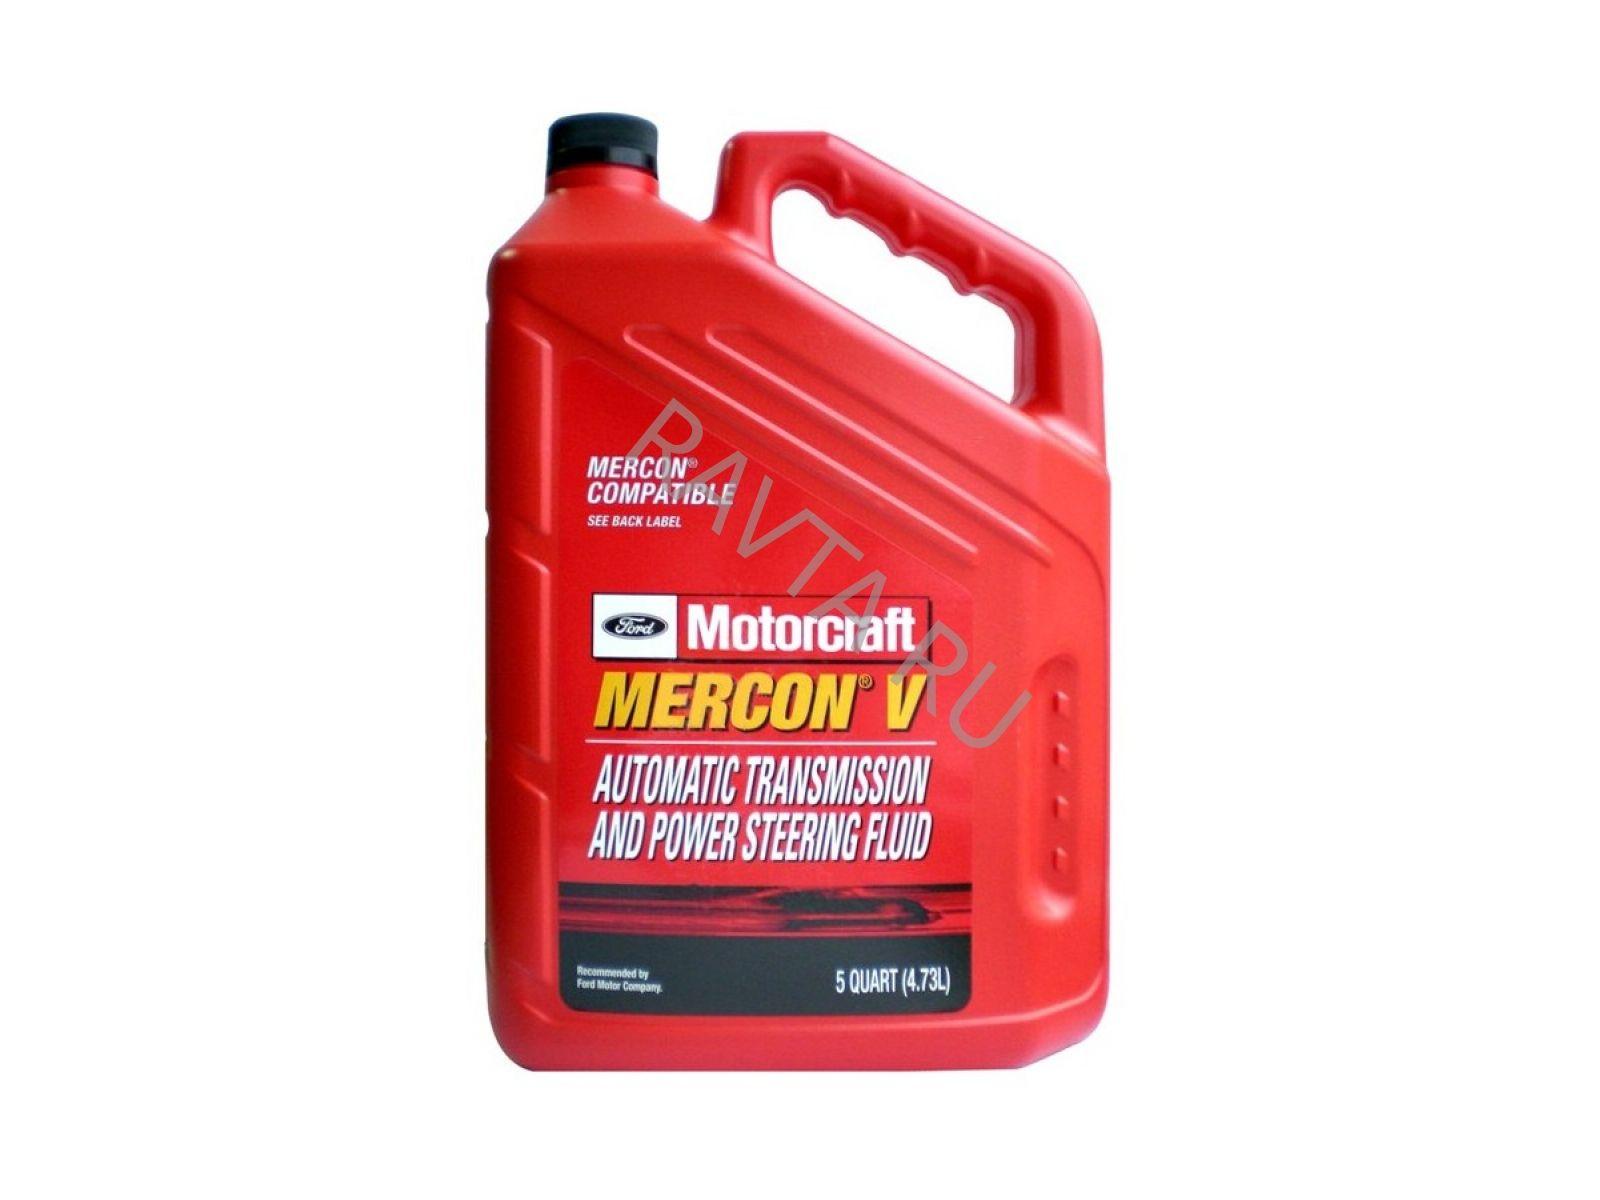 Жидкость Motorcraft Mercon V (4,73л) от Ravta